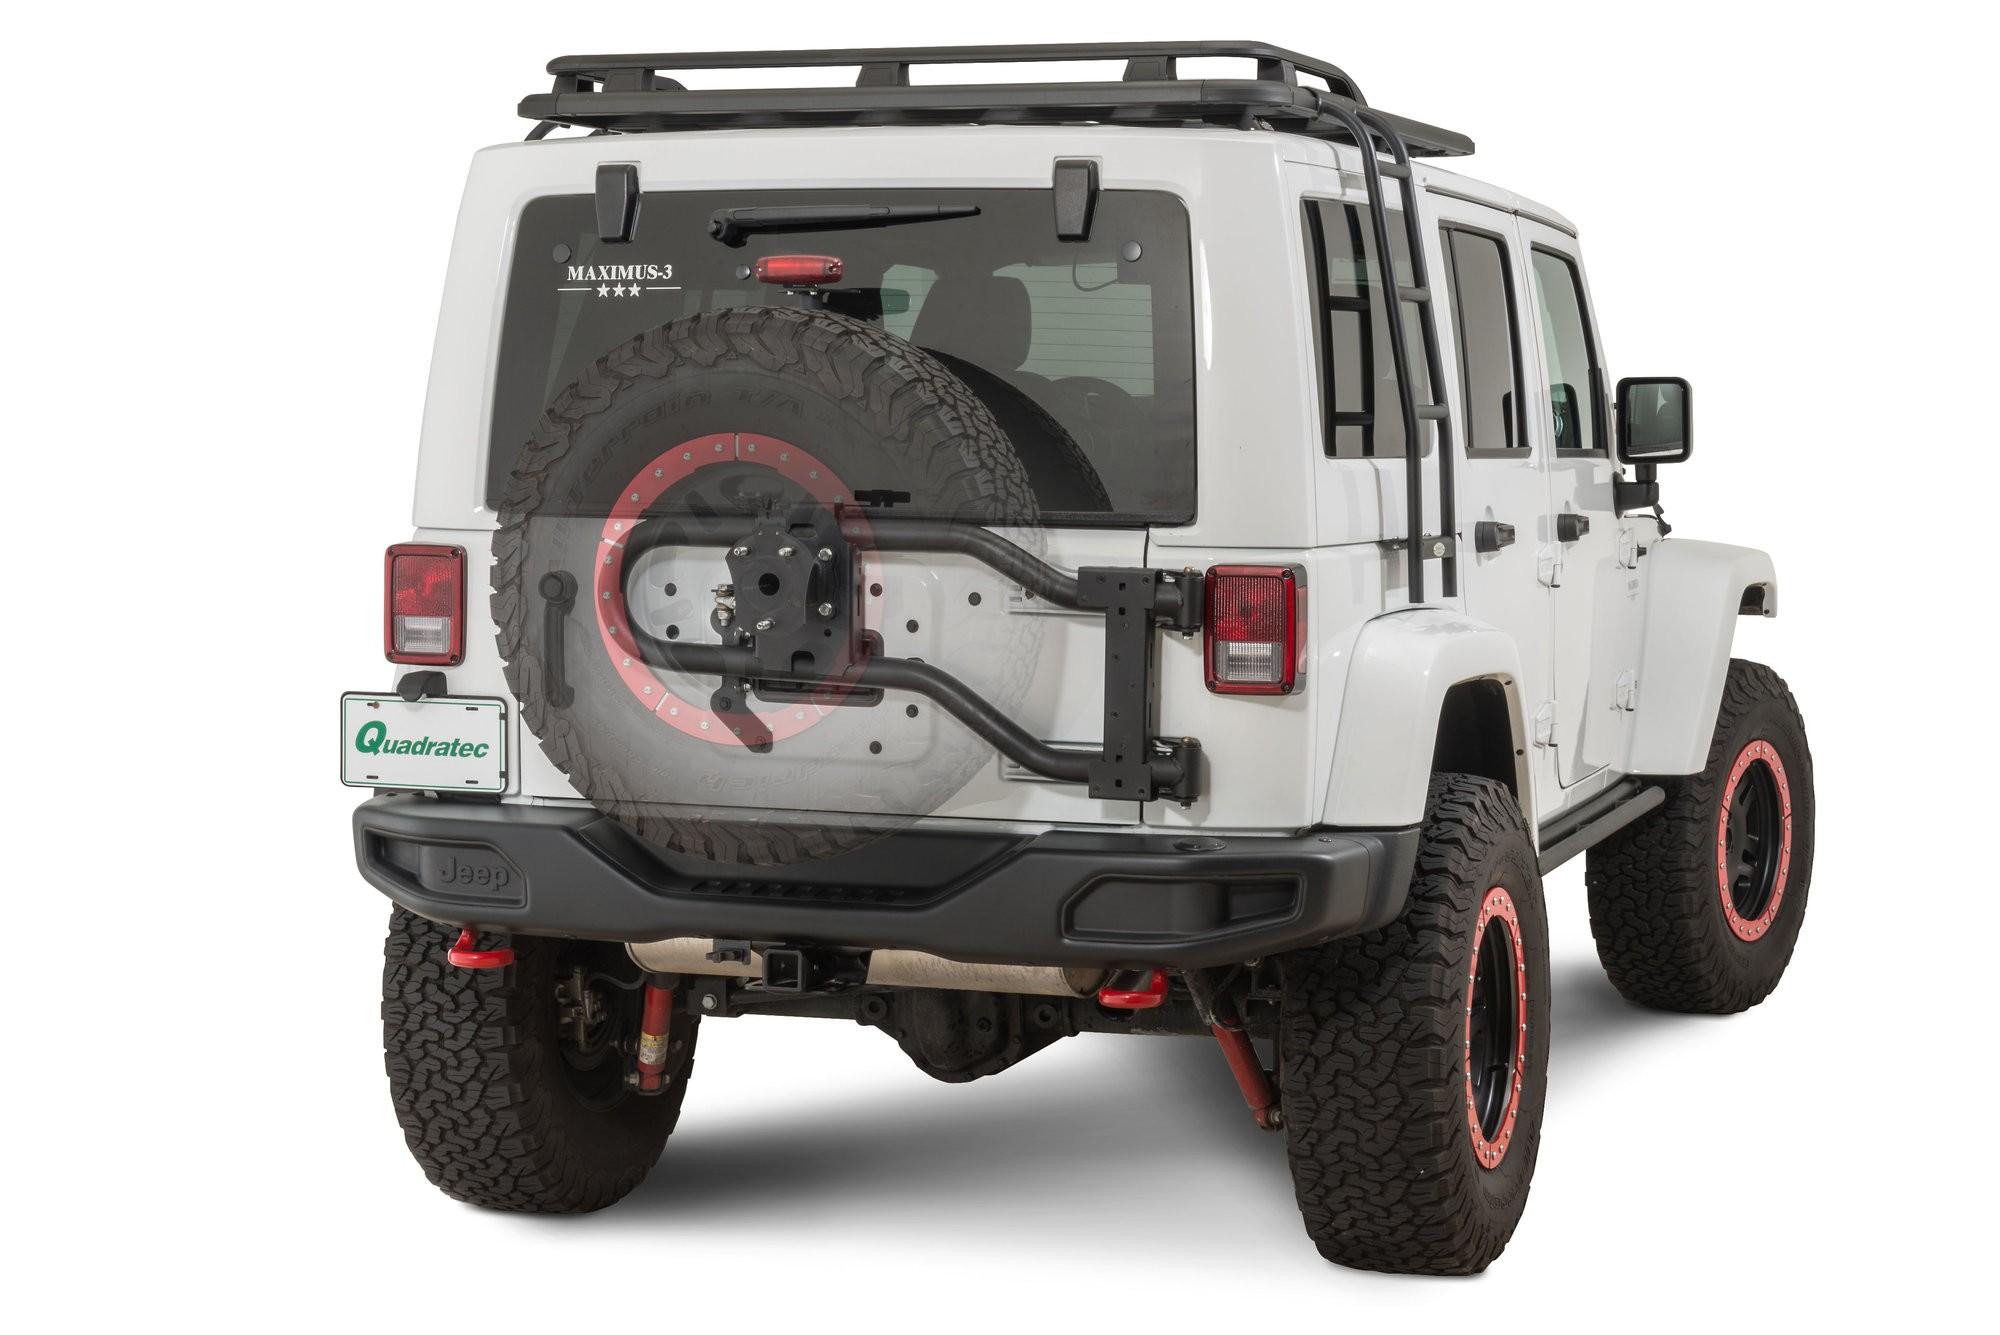 1997 Jeep Wrangler Parts Diagram Maximus 3 0400 0300tc Bp Modular Tire Carrier for 07 18 Jeep Of 1997 Jeep Wrangler Parts Diagram